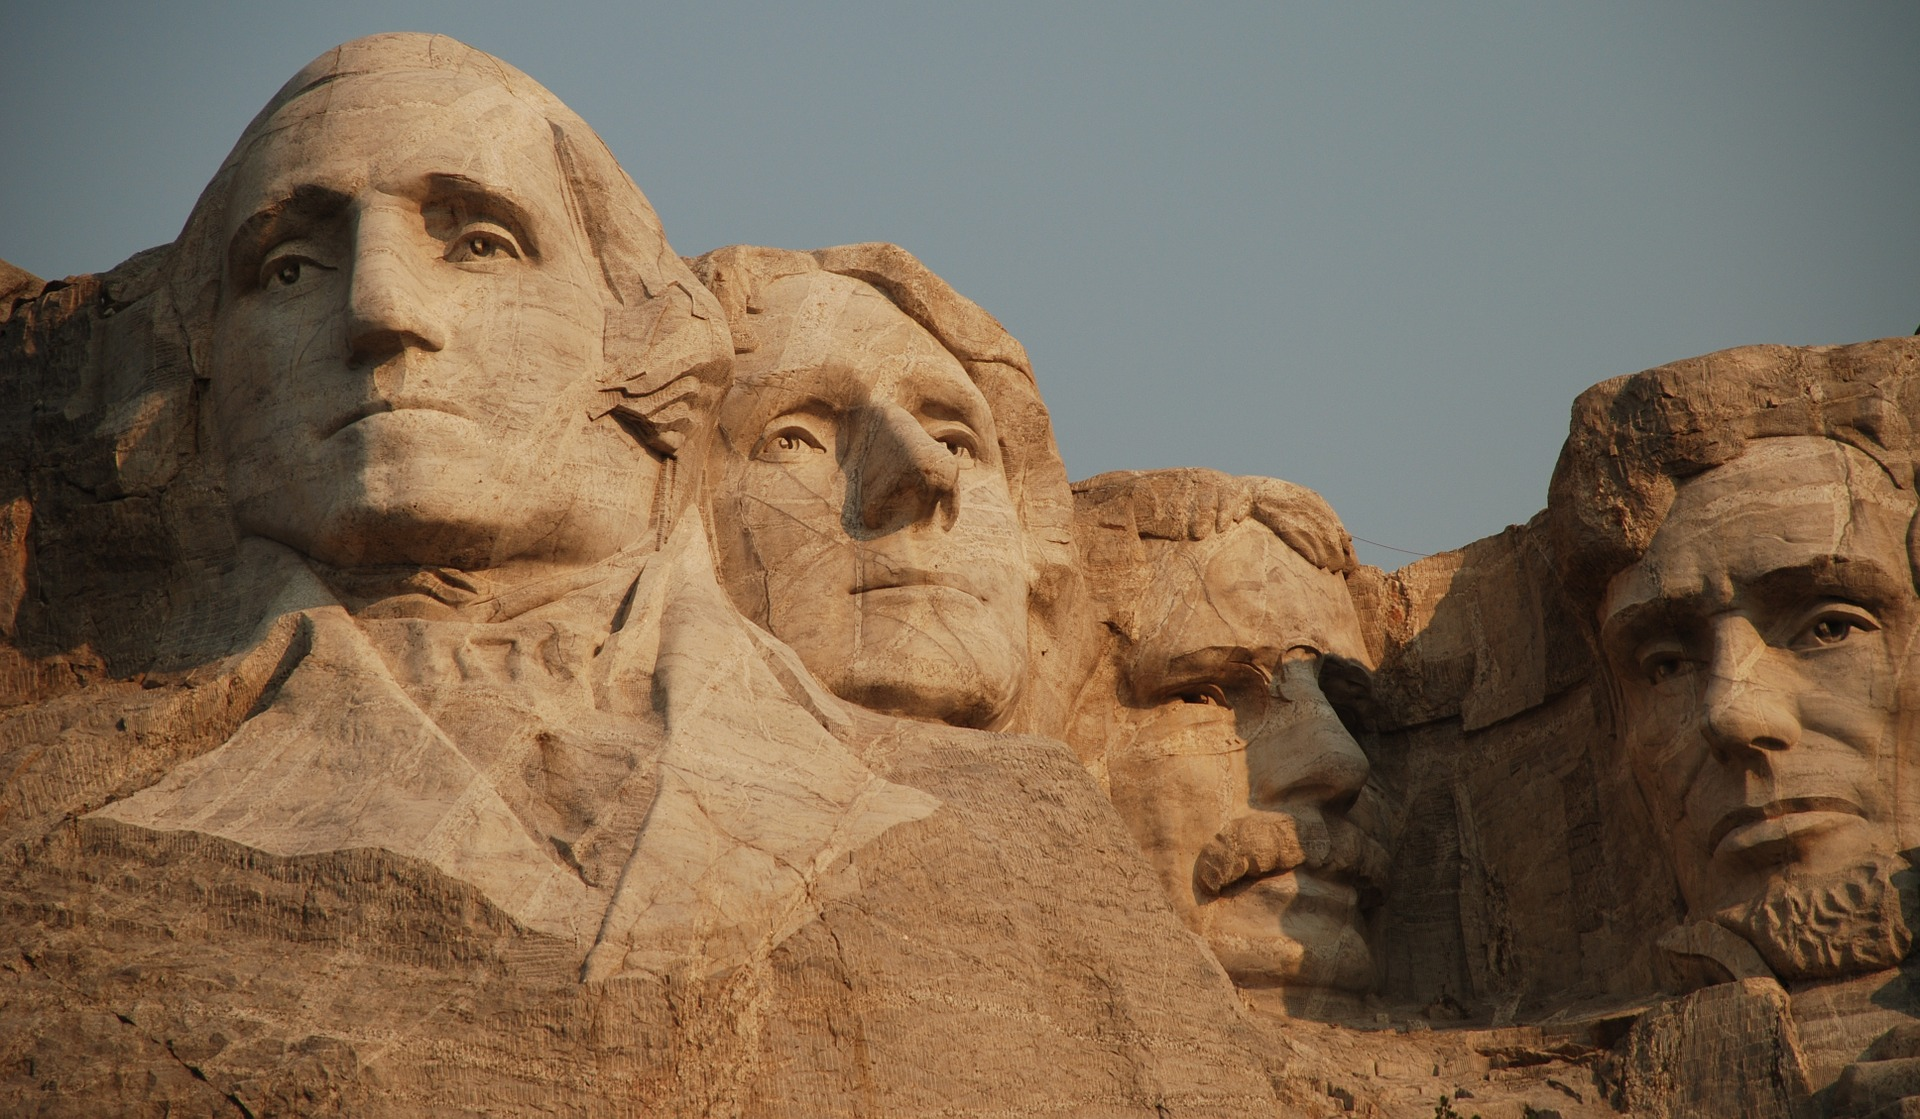 Mount Rushmore and George Washington